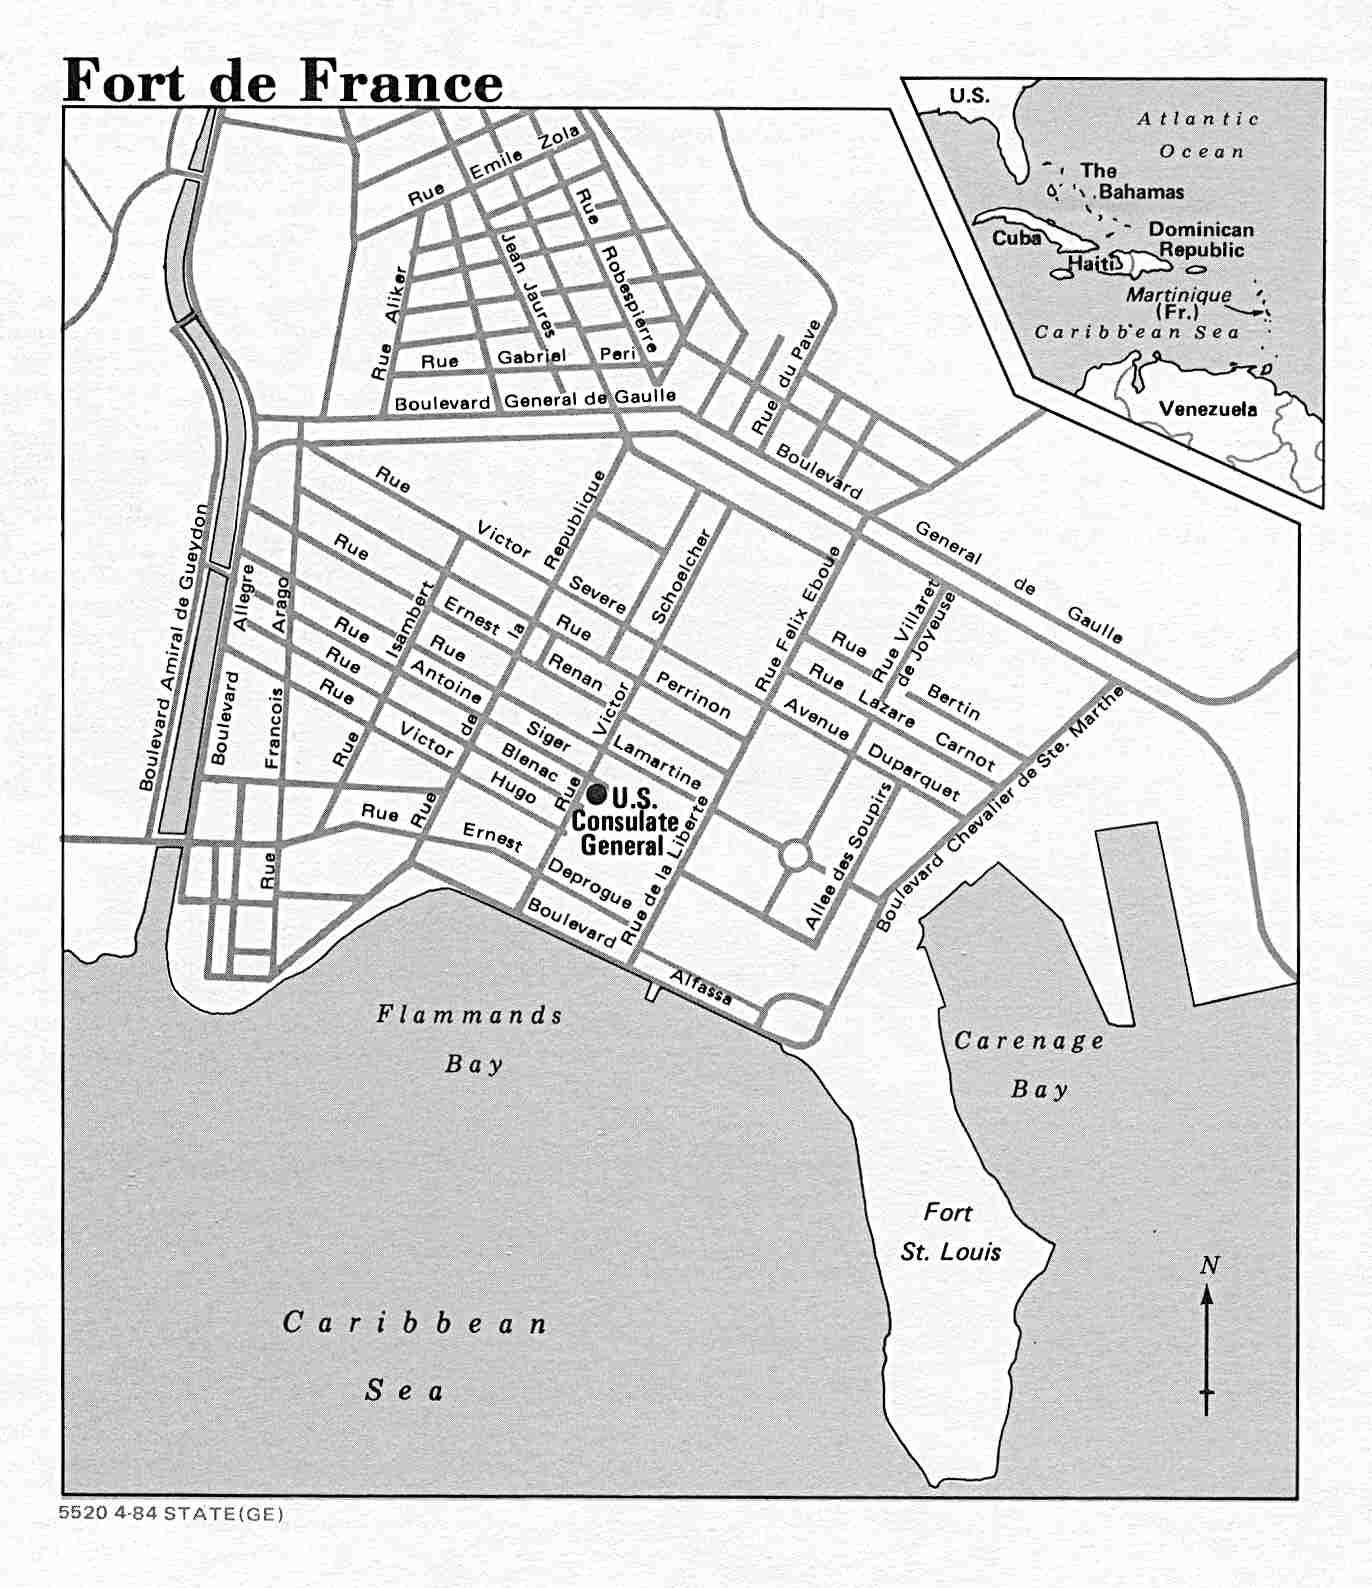 Fort de France Street Map Fort de France Martinique mappery – Streetmap France